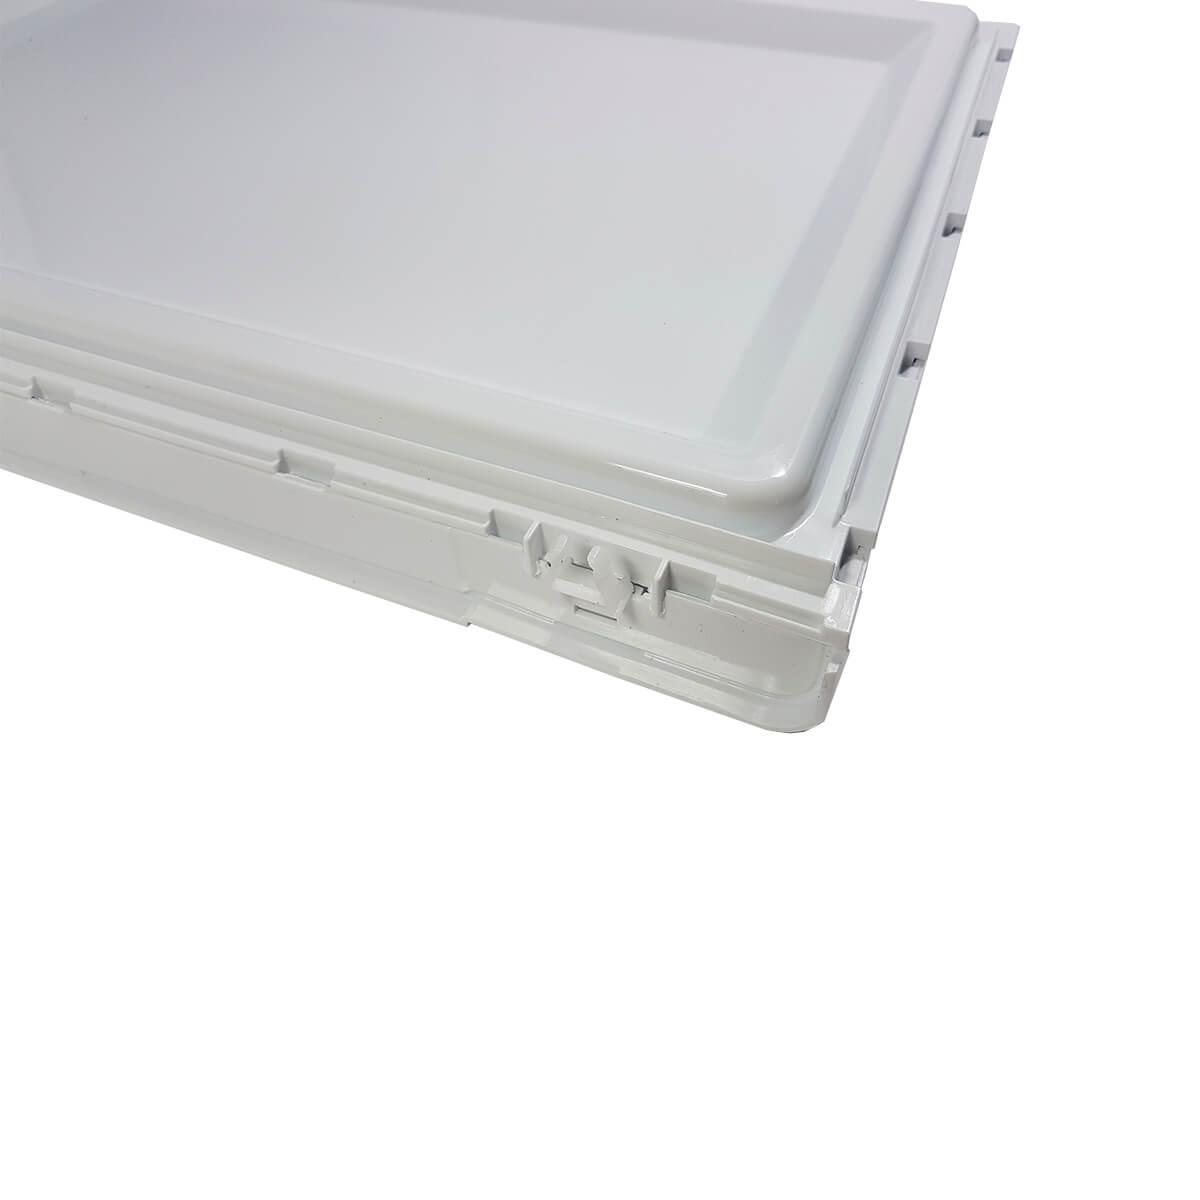 Porta Do Congelador Completa Para Refrigerador Frost Free Electrolux RFE38 RFE39 - 70200657